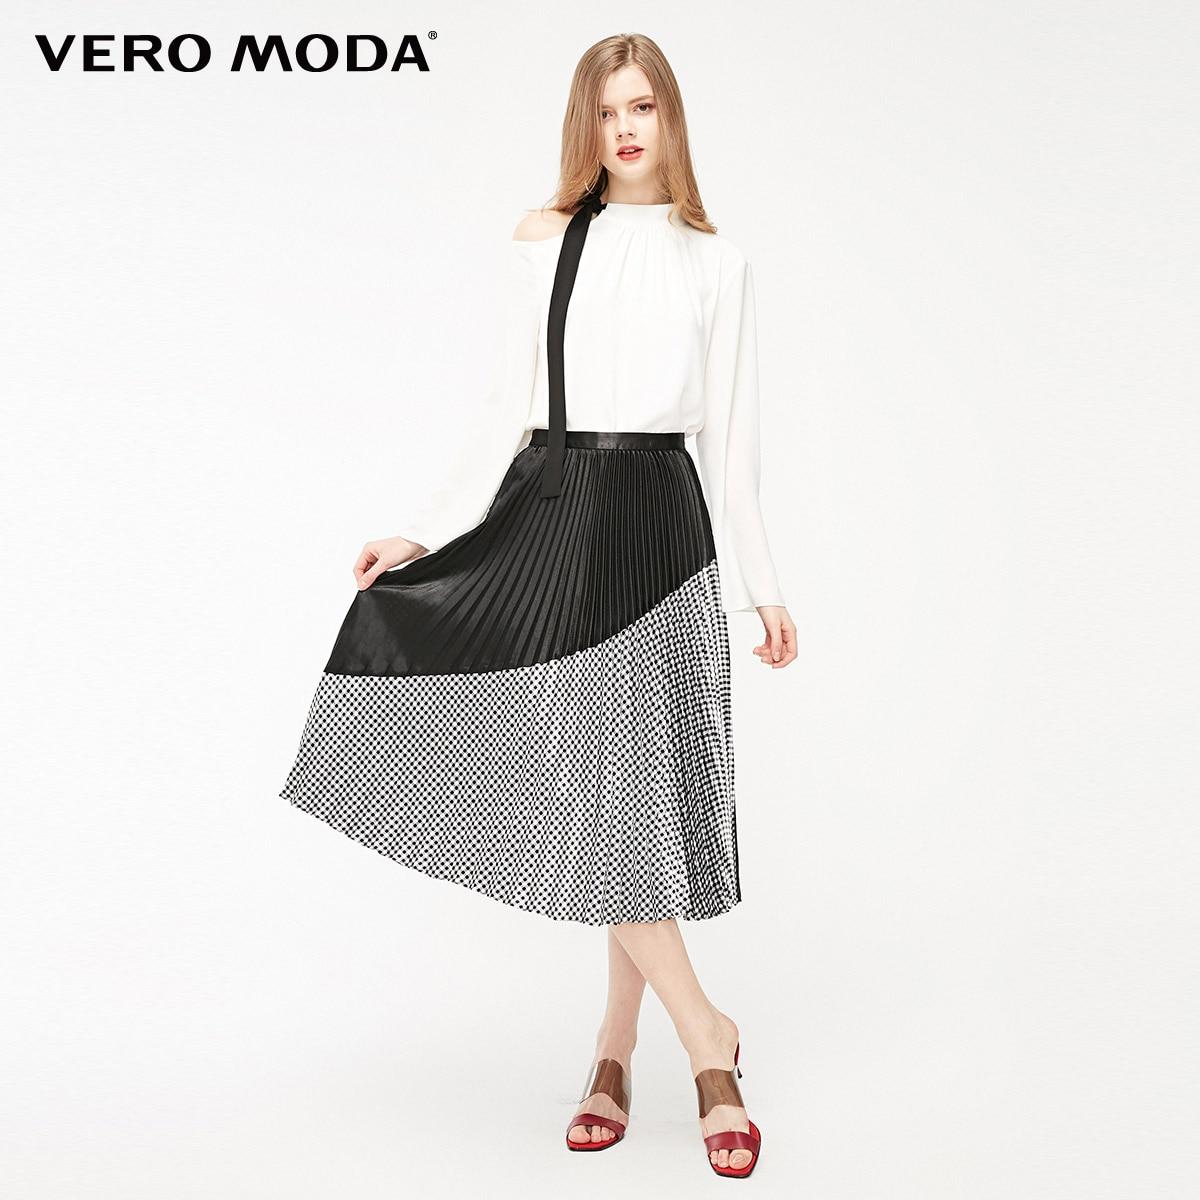 Vero Moda Women's Plaid Splice Plated Mid-length Skirt | 319116530